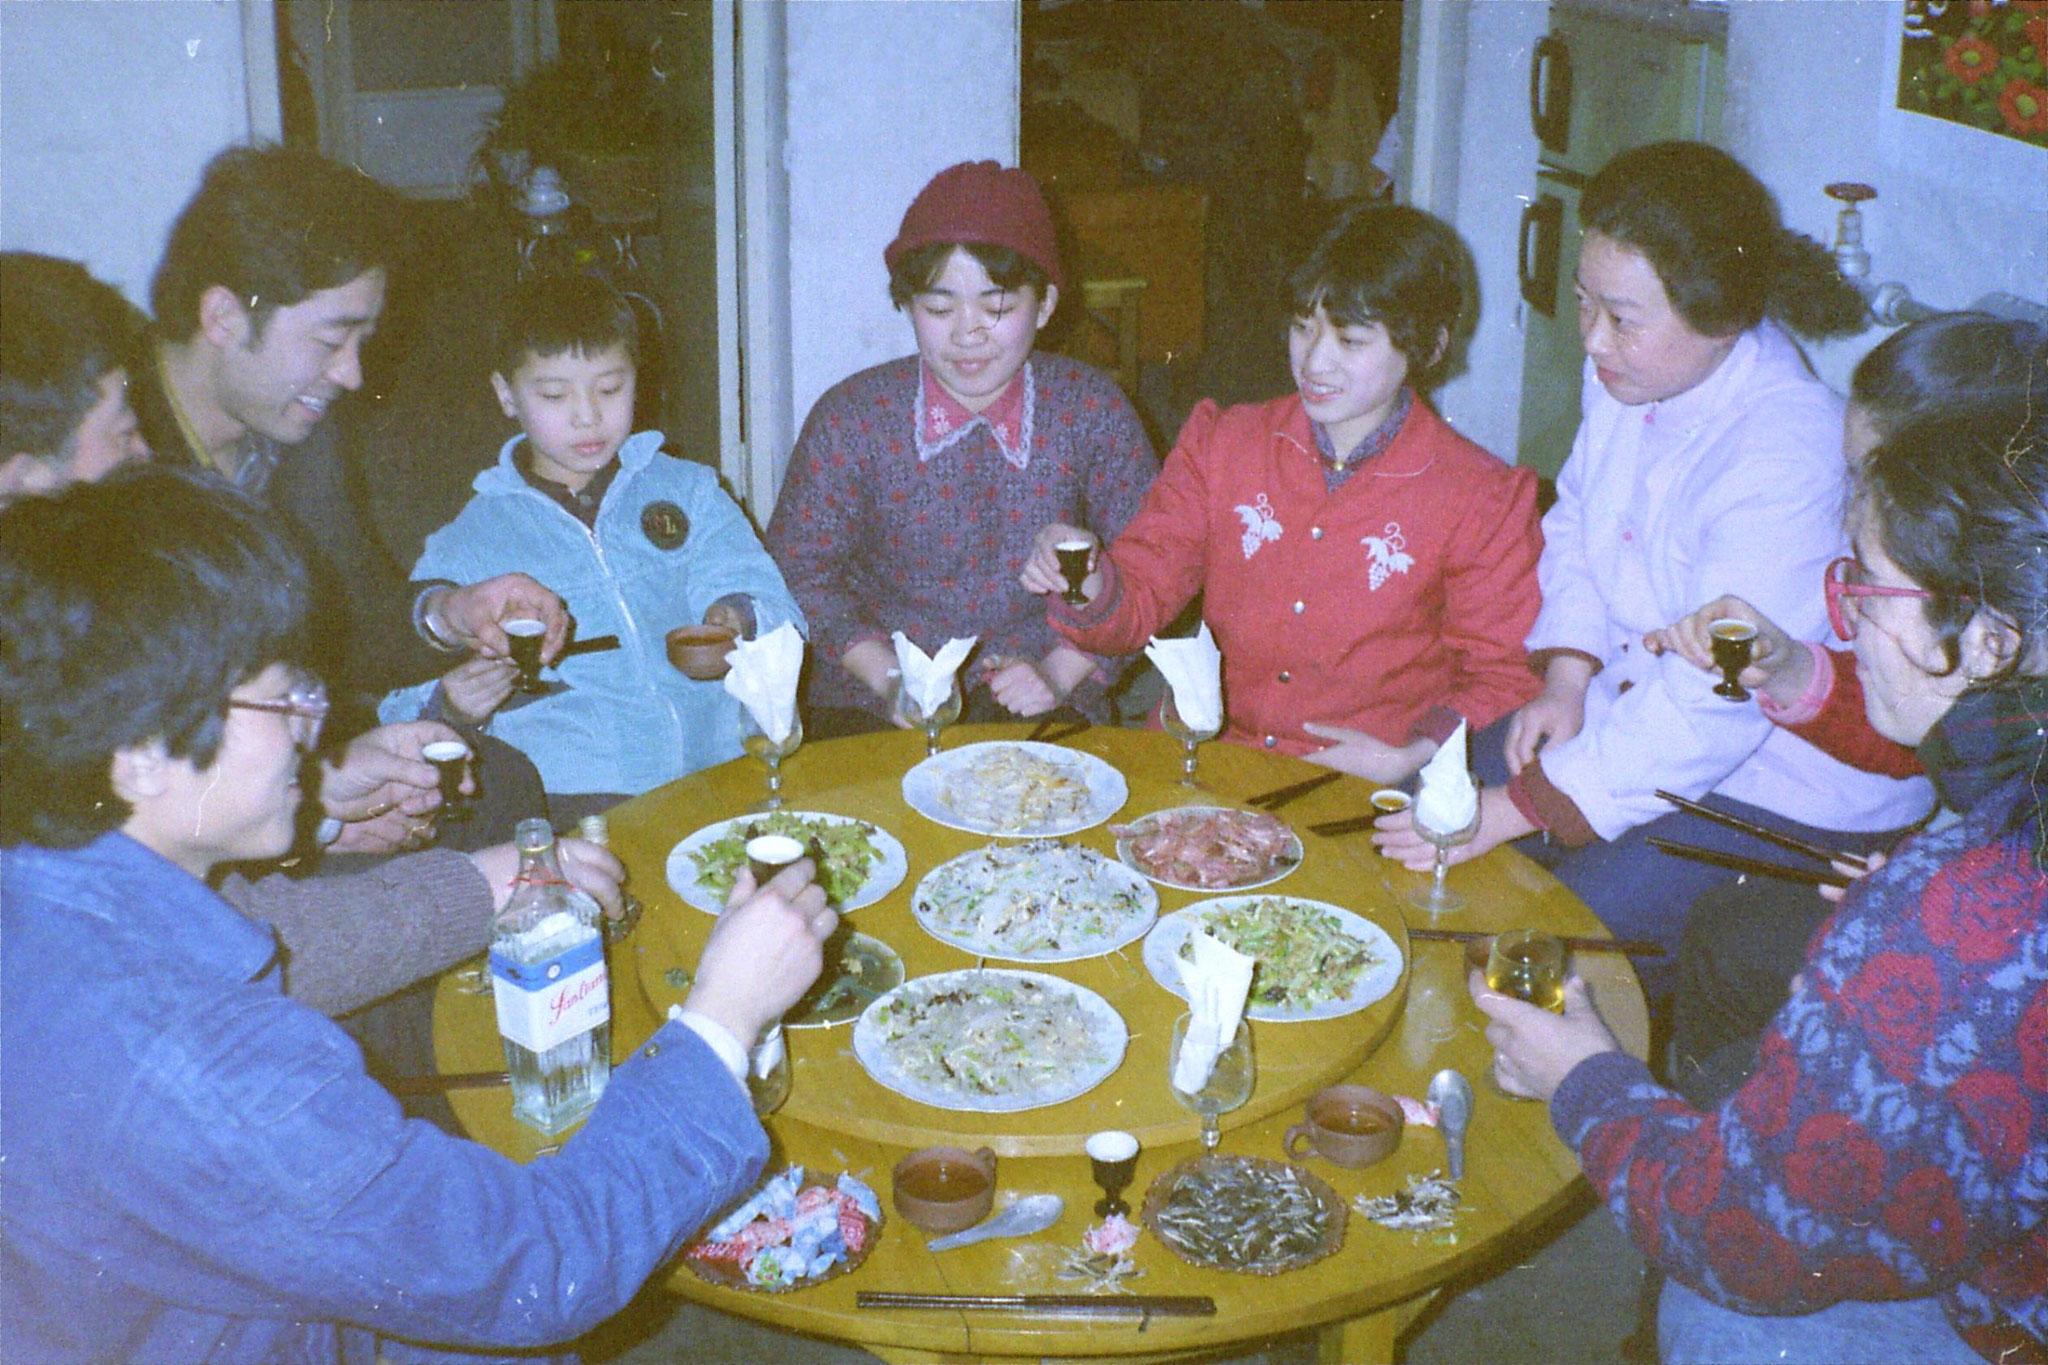 15/2/1989: 23: Liu Bo's cousin's flat